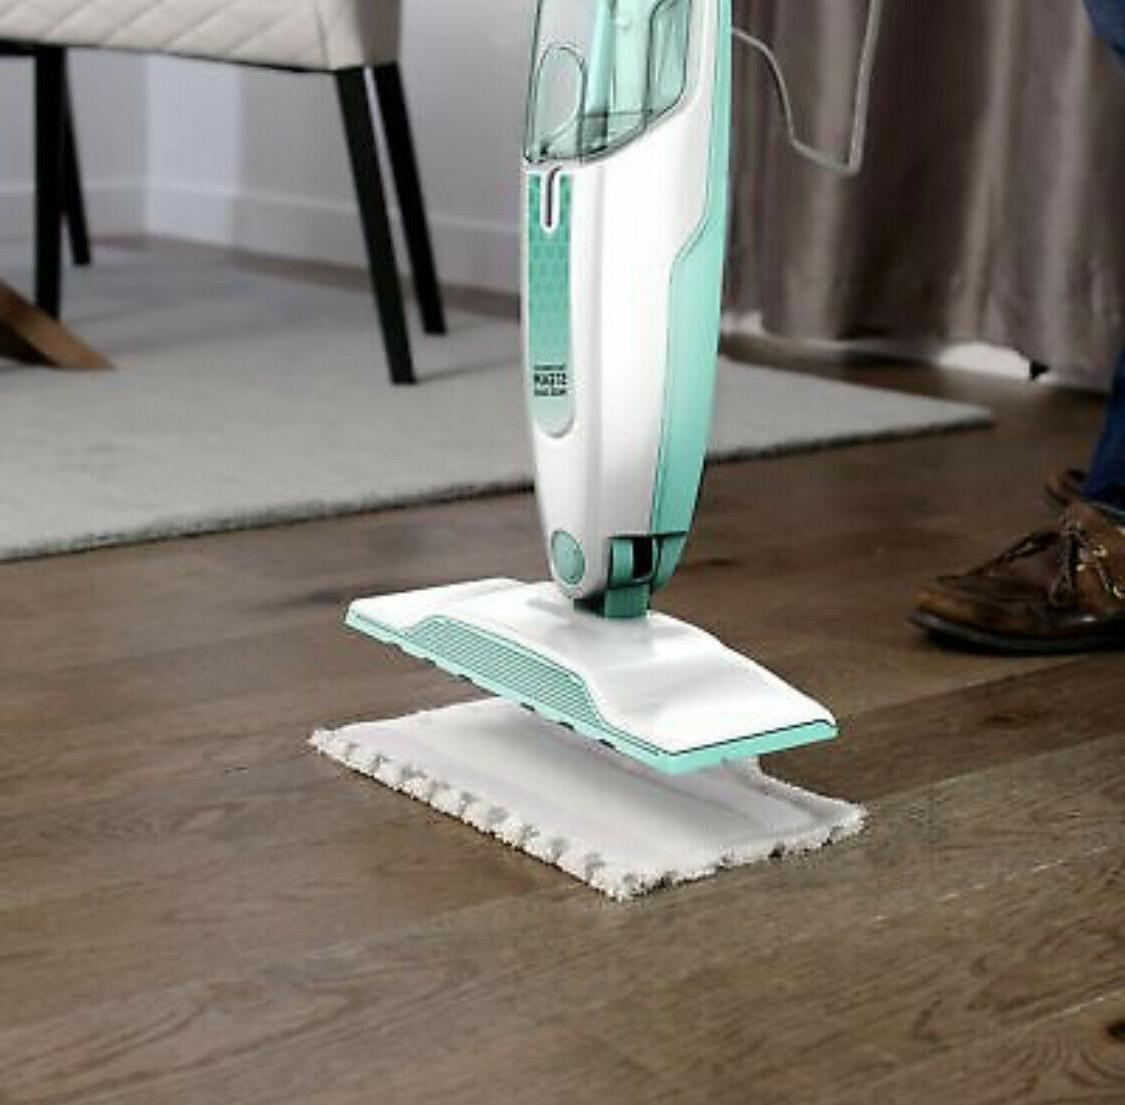 Shark S1000W Mop Hard Floor Cleaner XL Removable